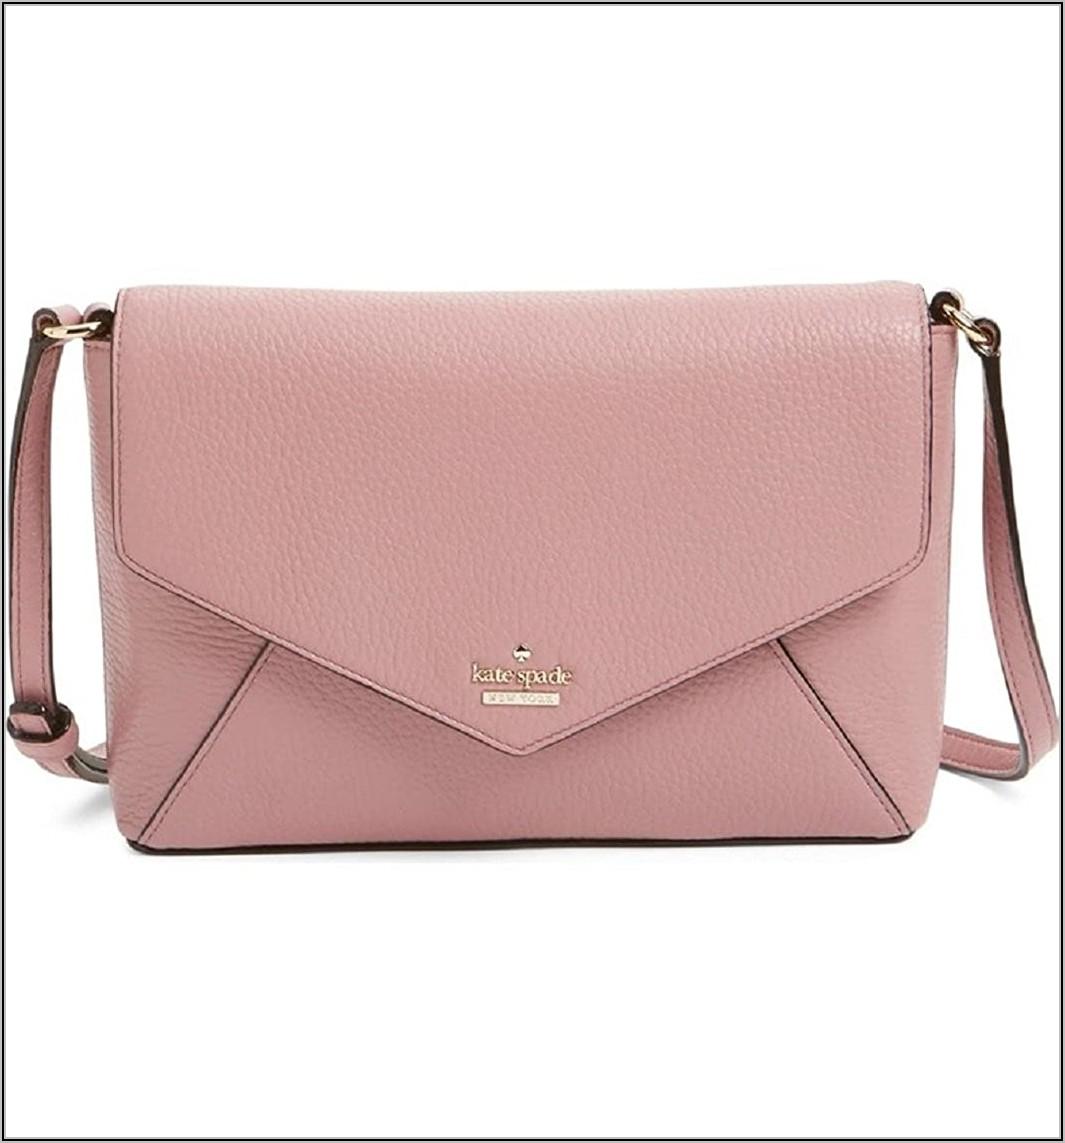 Kate Spade Leather Envelope Bag